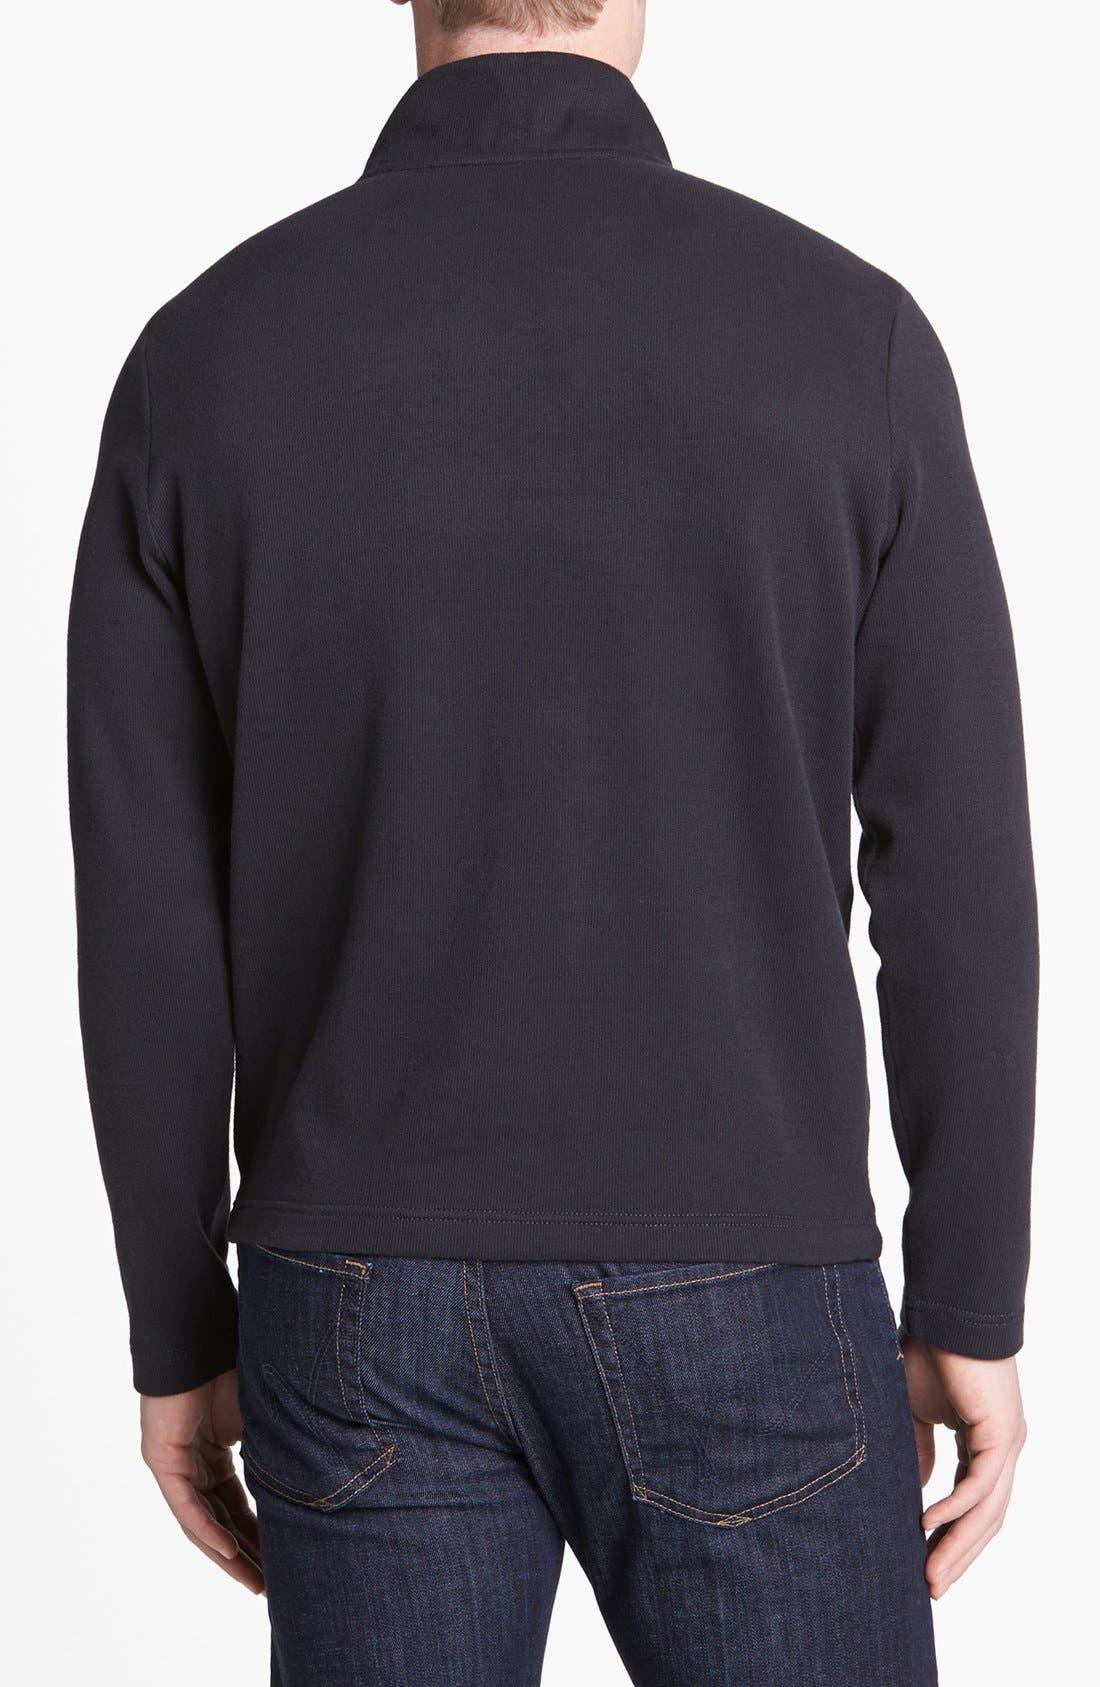 Alternate Image 2  - Robert Barakett 'Niles' Half Zip Sweatshirt